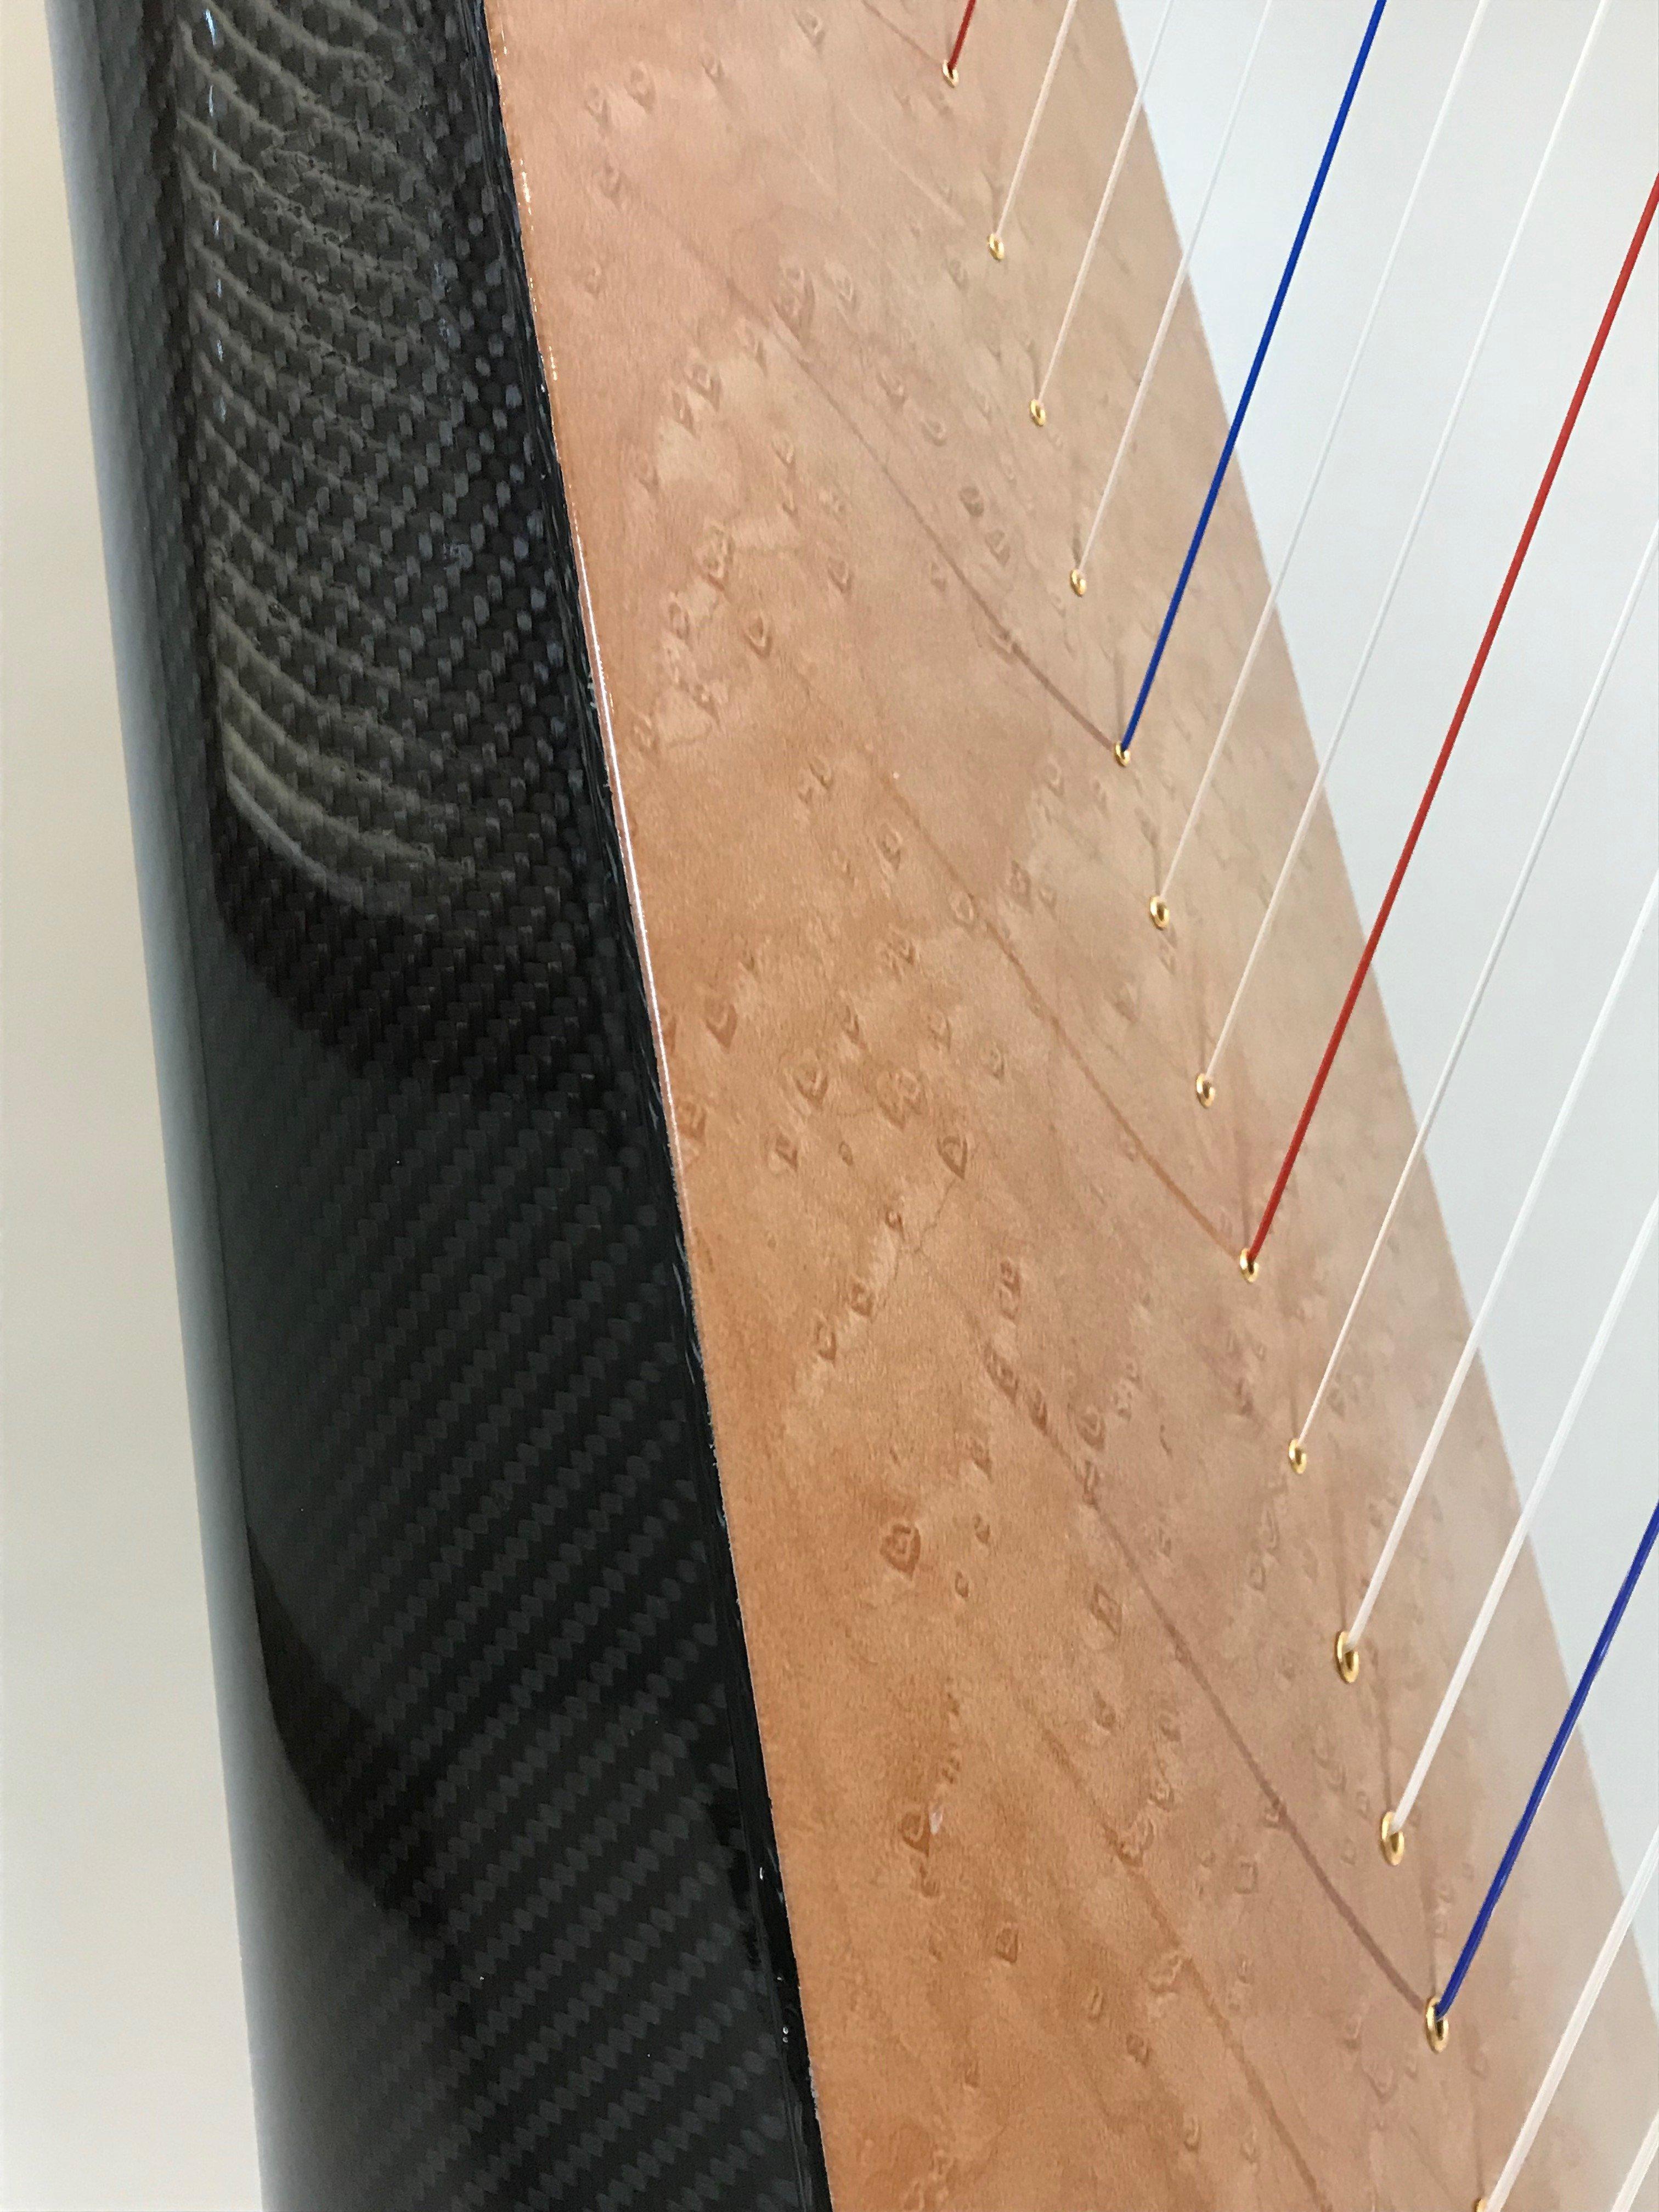 wood grain on carbon fiber harp